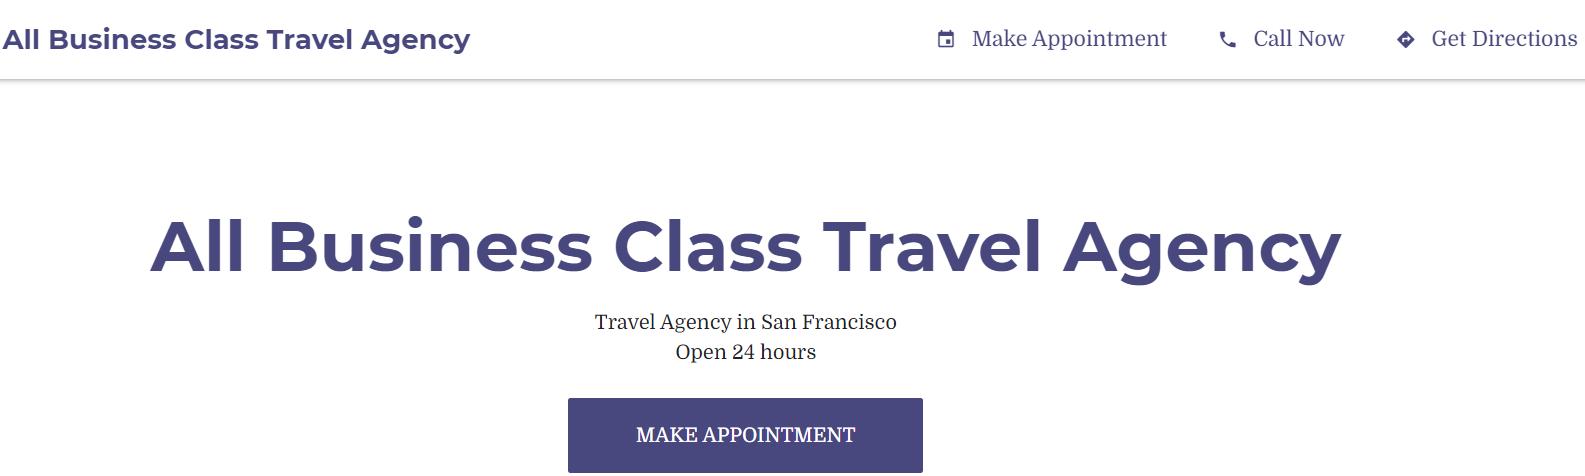 Best Travel Agencies in San Francisco